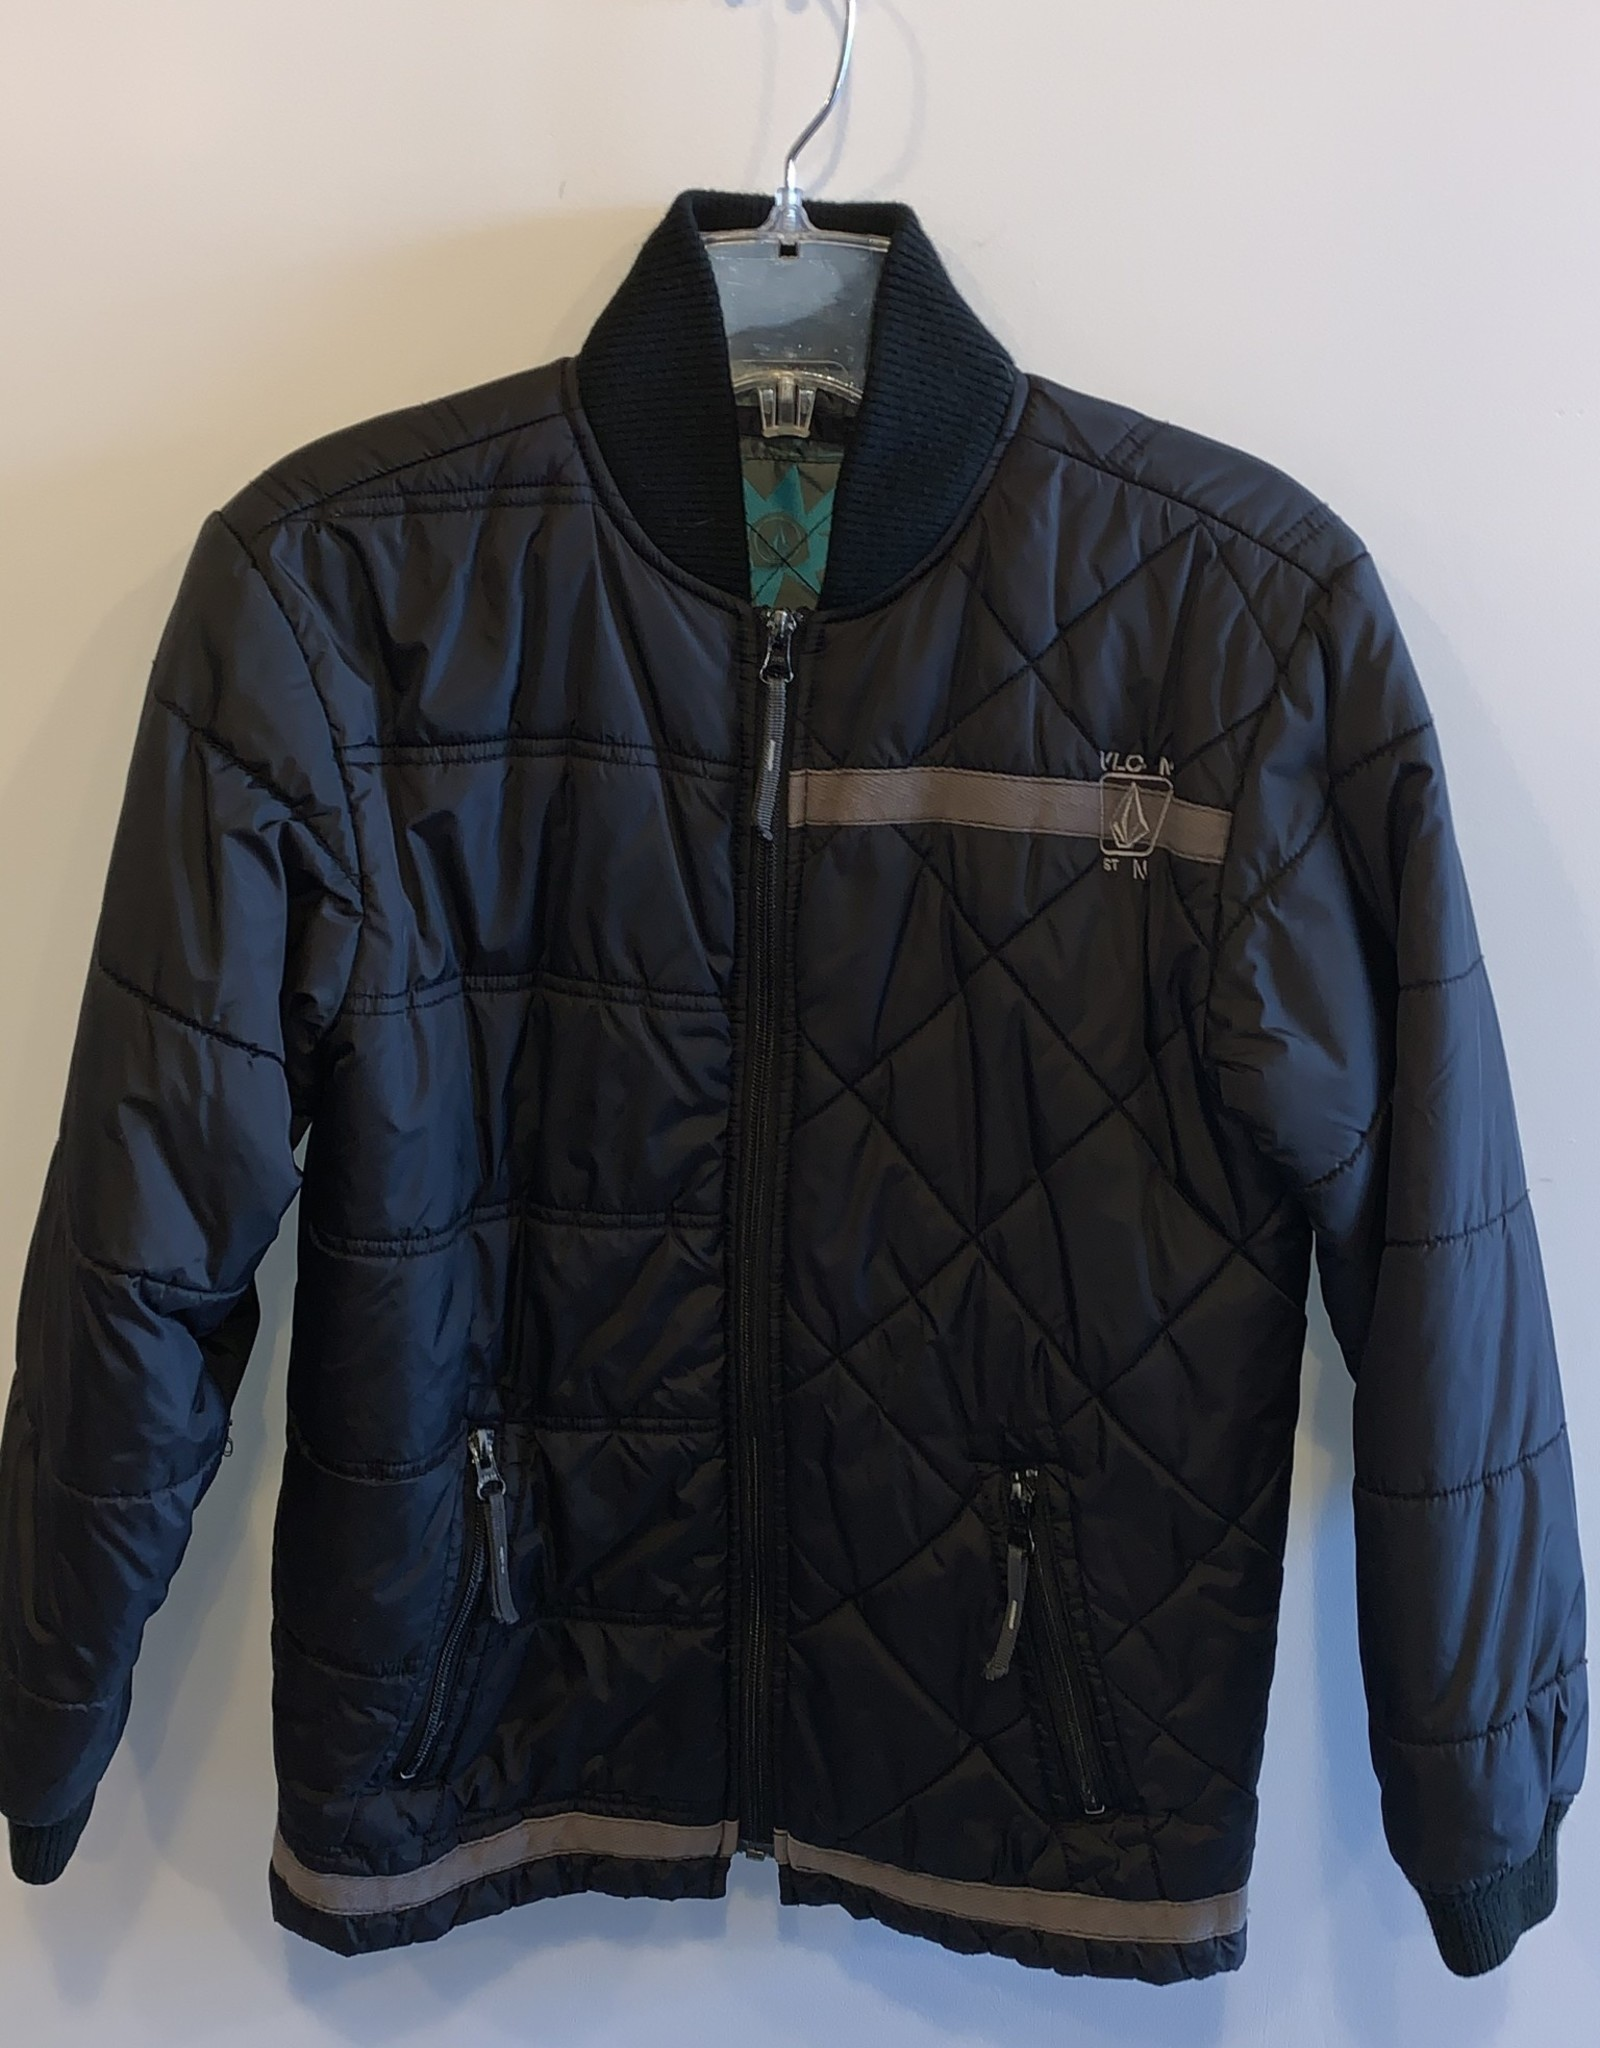 Volcom Boys/12/Volcom/Jacket